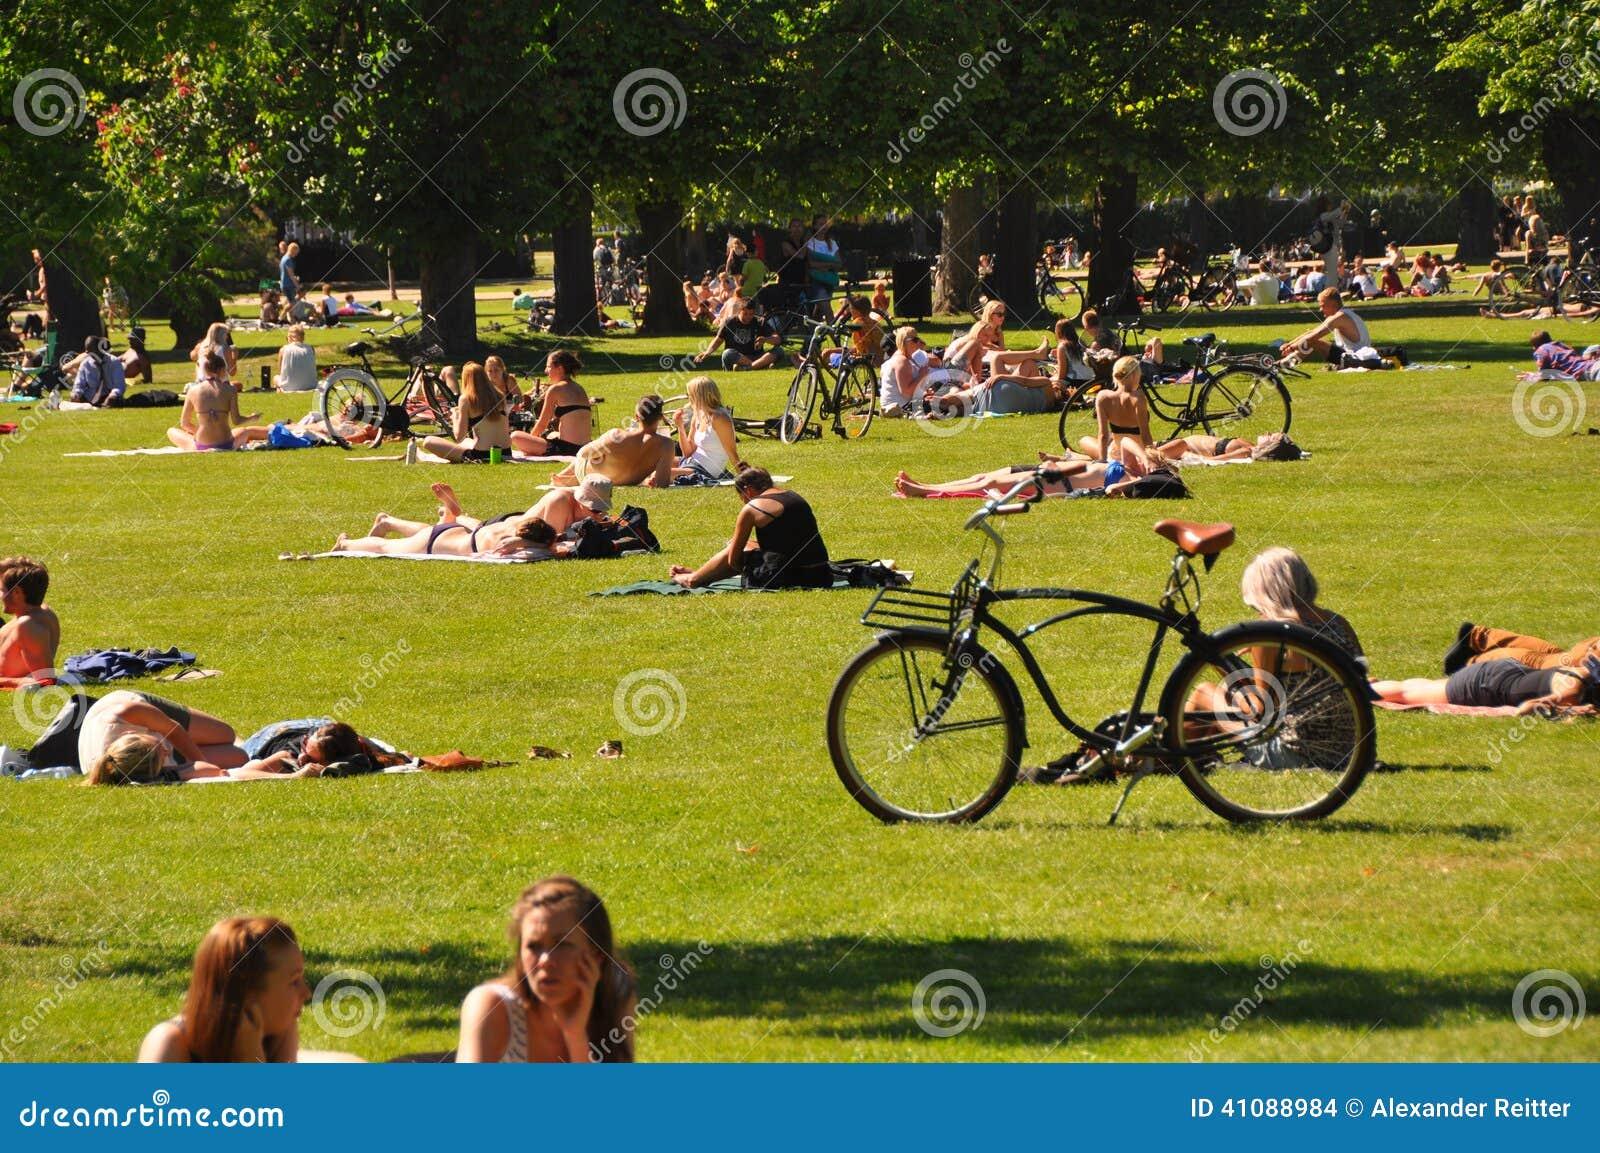 Urban Lifestyle - People Sunbathing In City Park ...